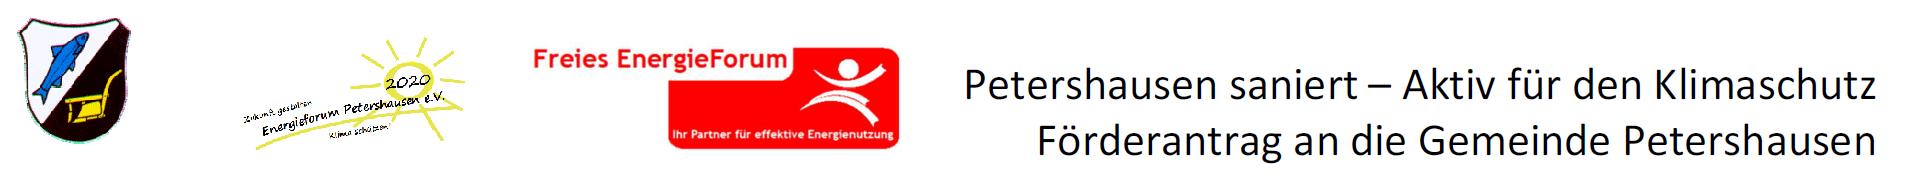 logo_petershausen_saniert